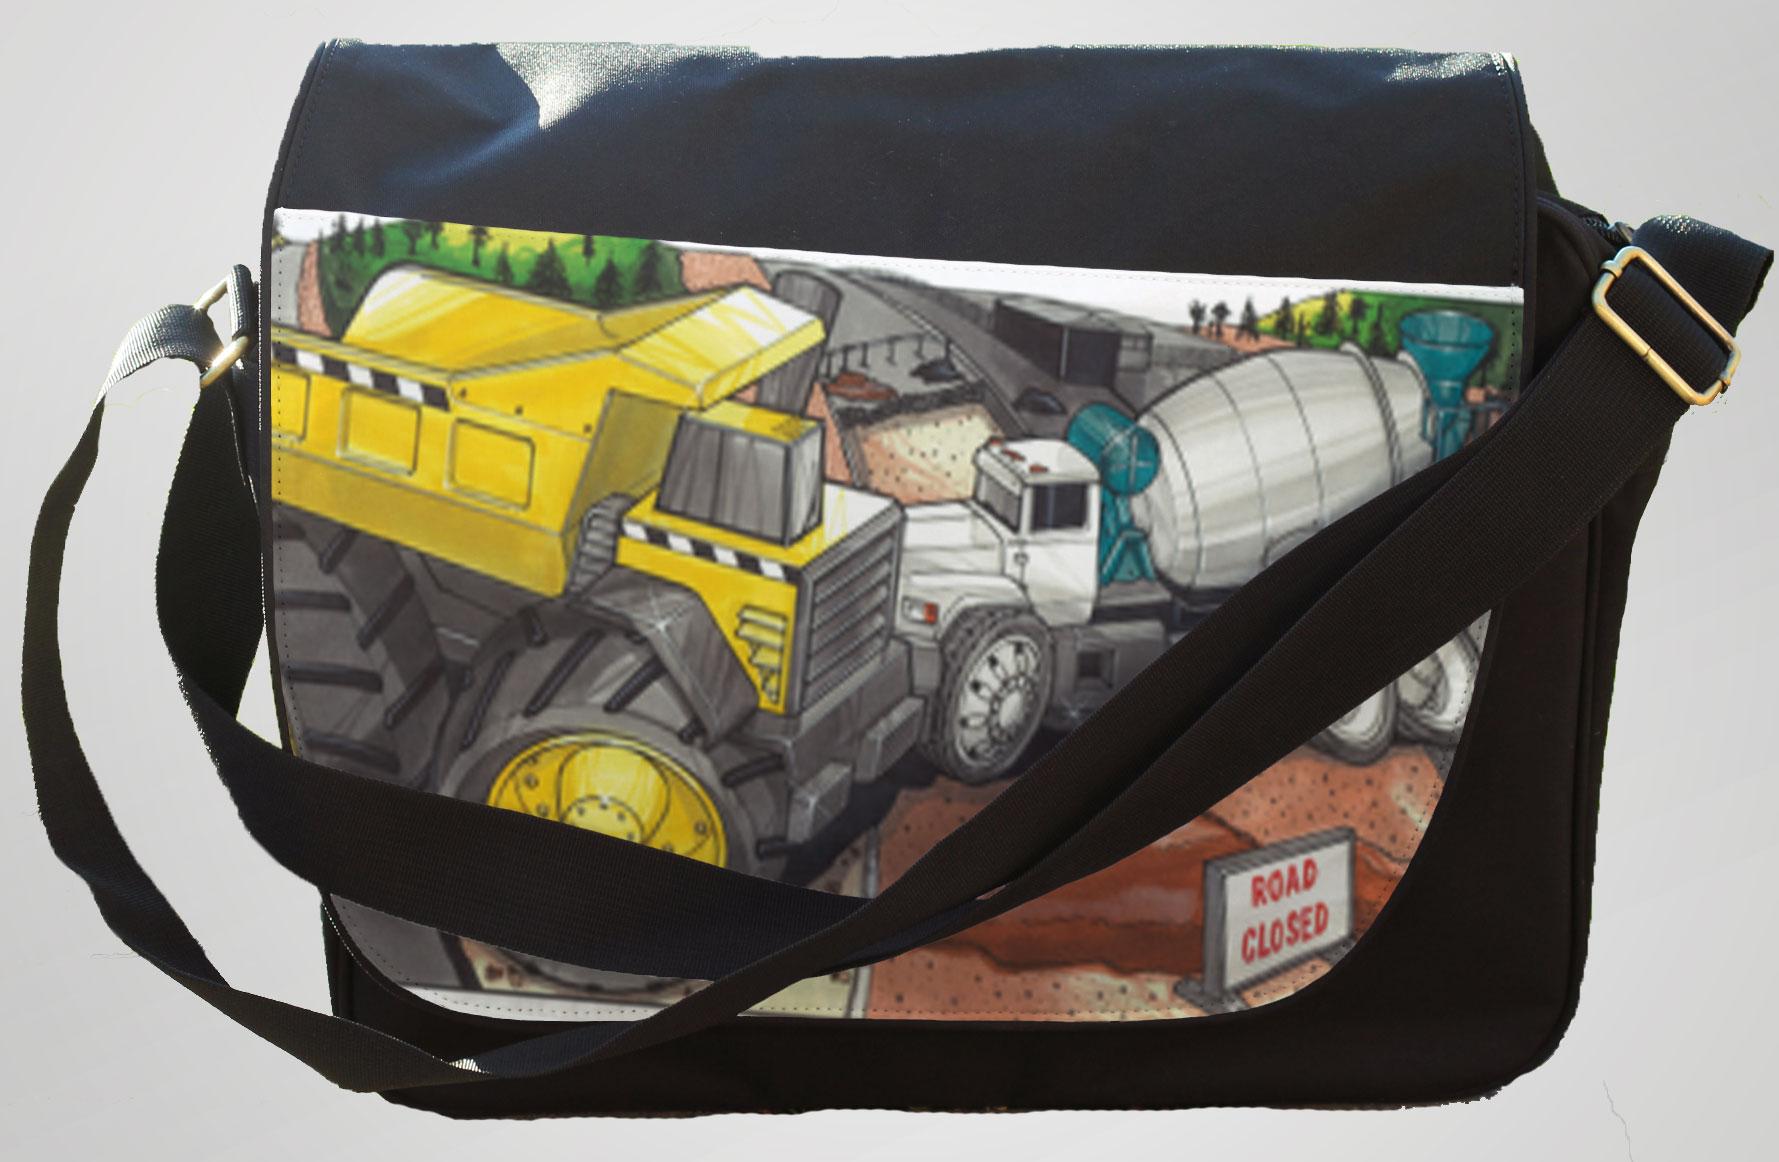 Koolart Construction Site 1805 Messenger/Reporters Bag